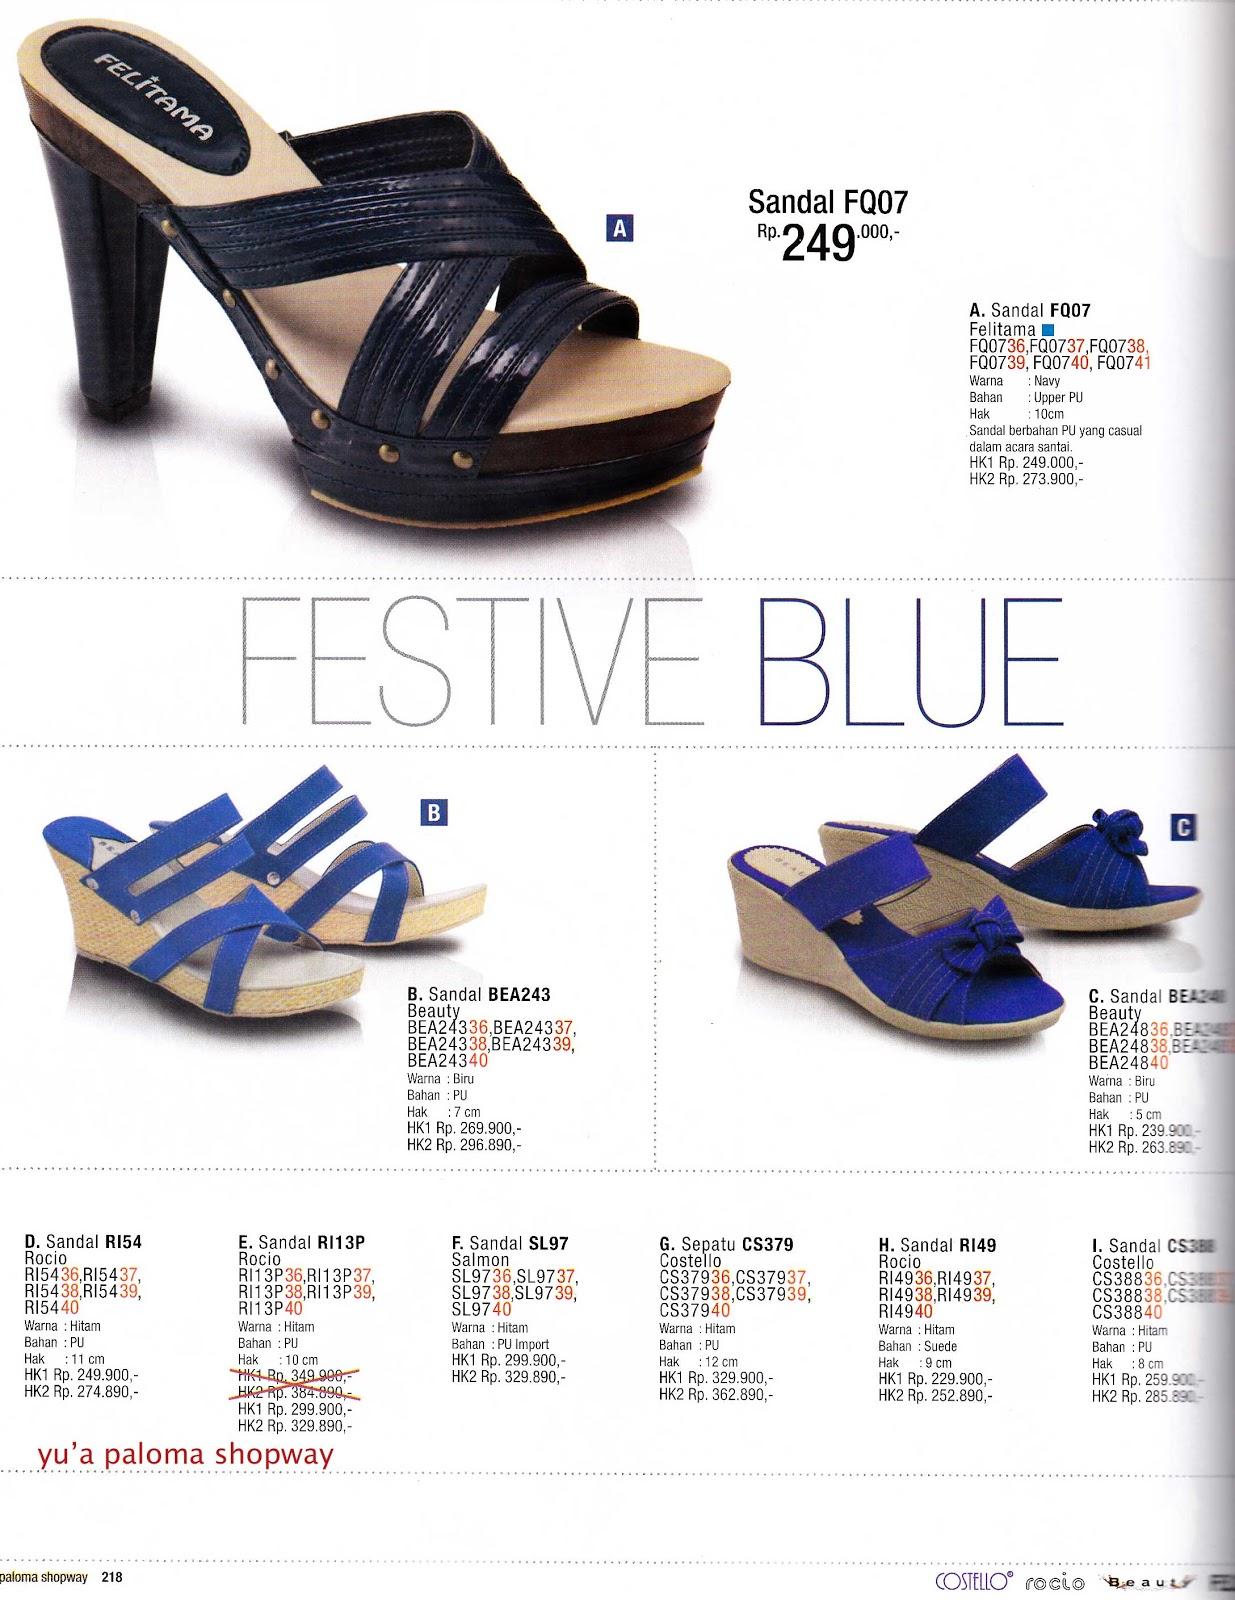 Sandal & Sepatu Wanita SALMON ROCIO COSTELLO RANDY GO GIRL SHUUZ